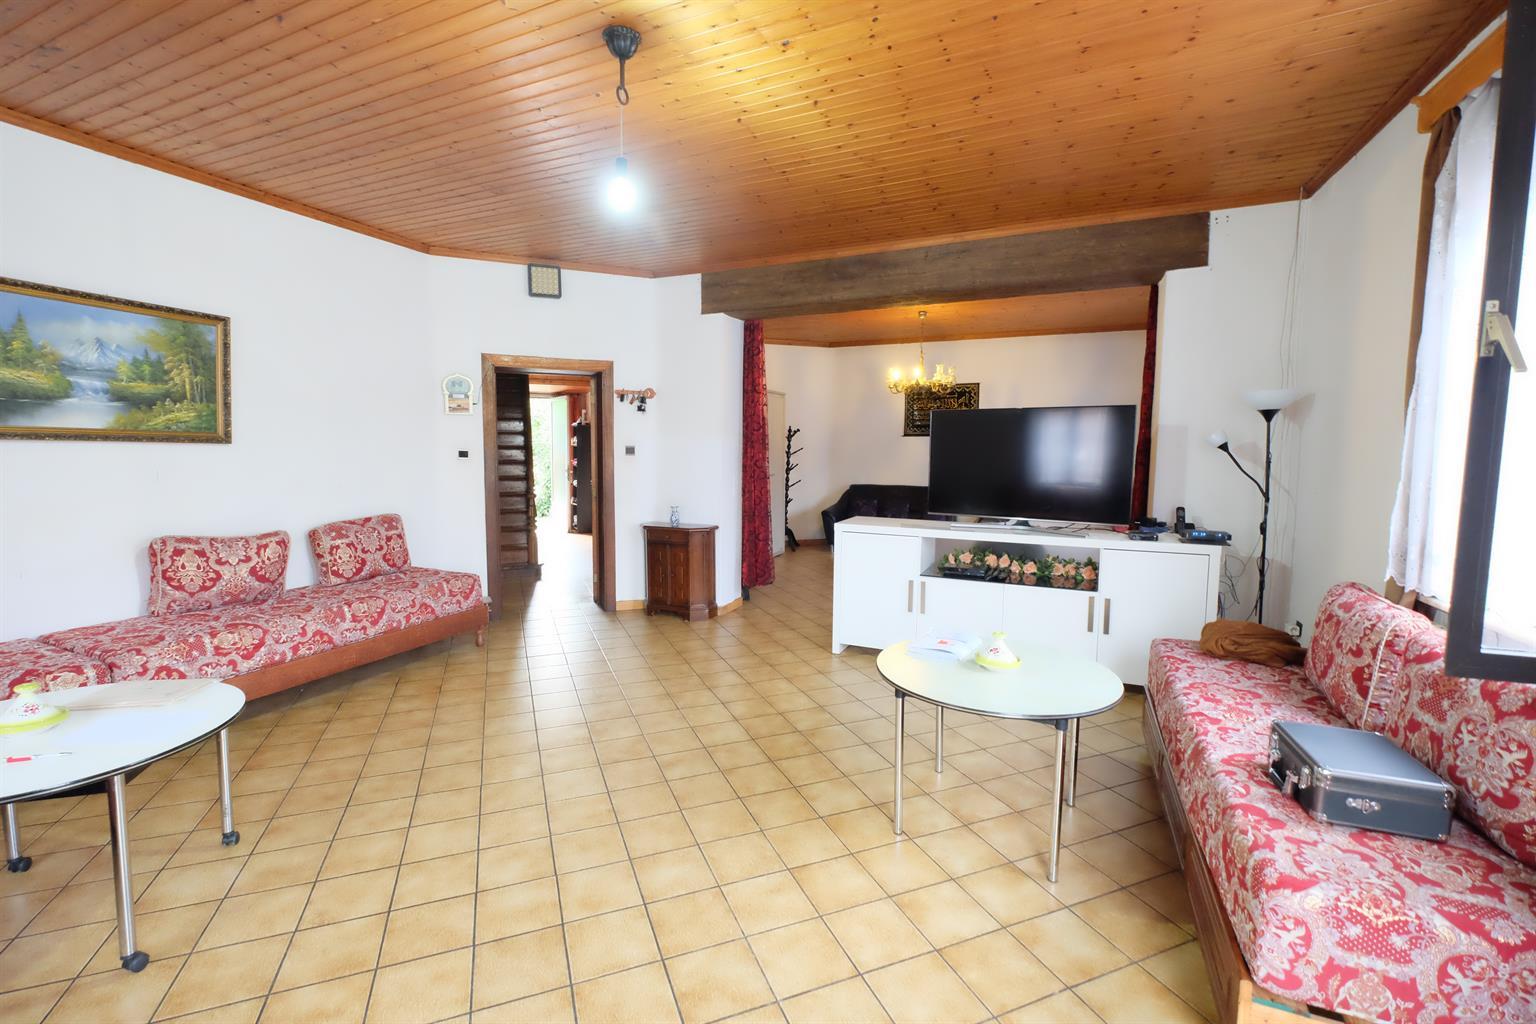 Maison - Colfontaine - #4501144-6